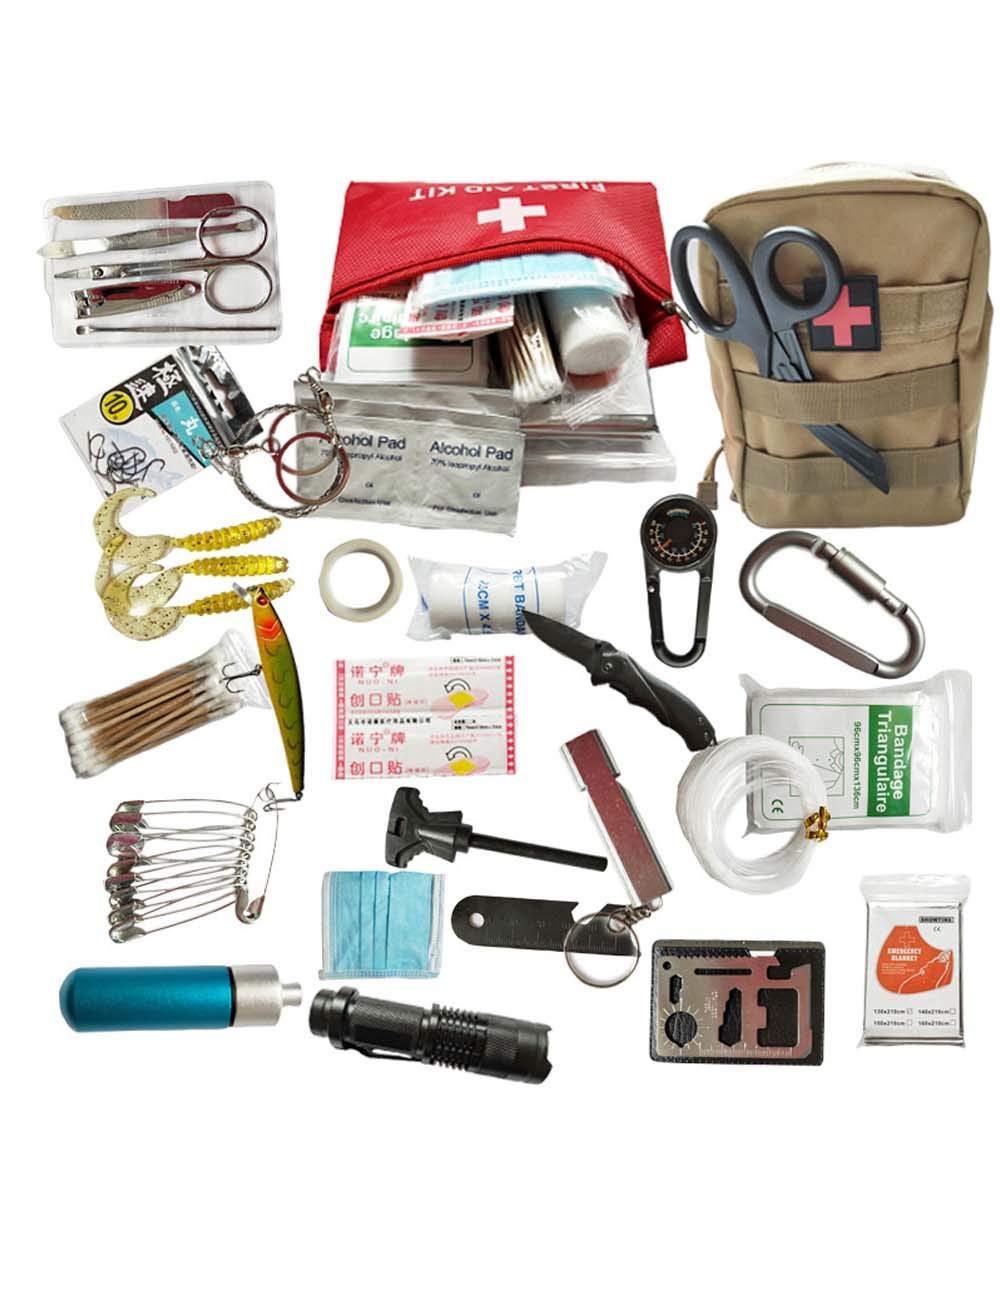 Geambo Medizinische Tasche Auto Tragbare Familie Notfall Kit Notfall Überleben Dringend Erste-Hilfe-Kit